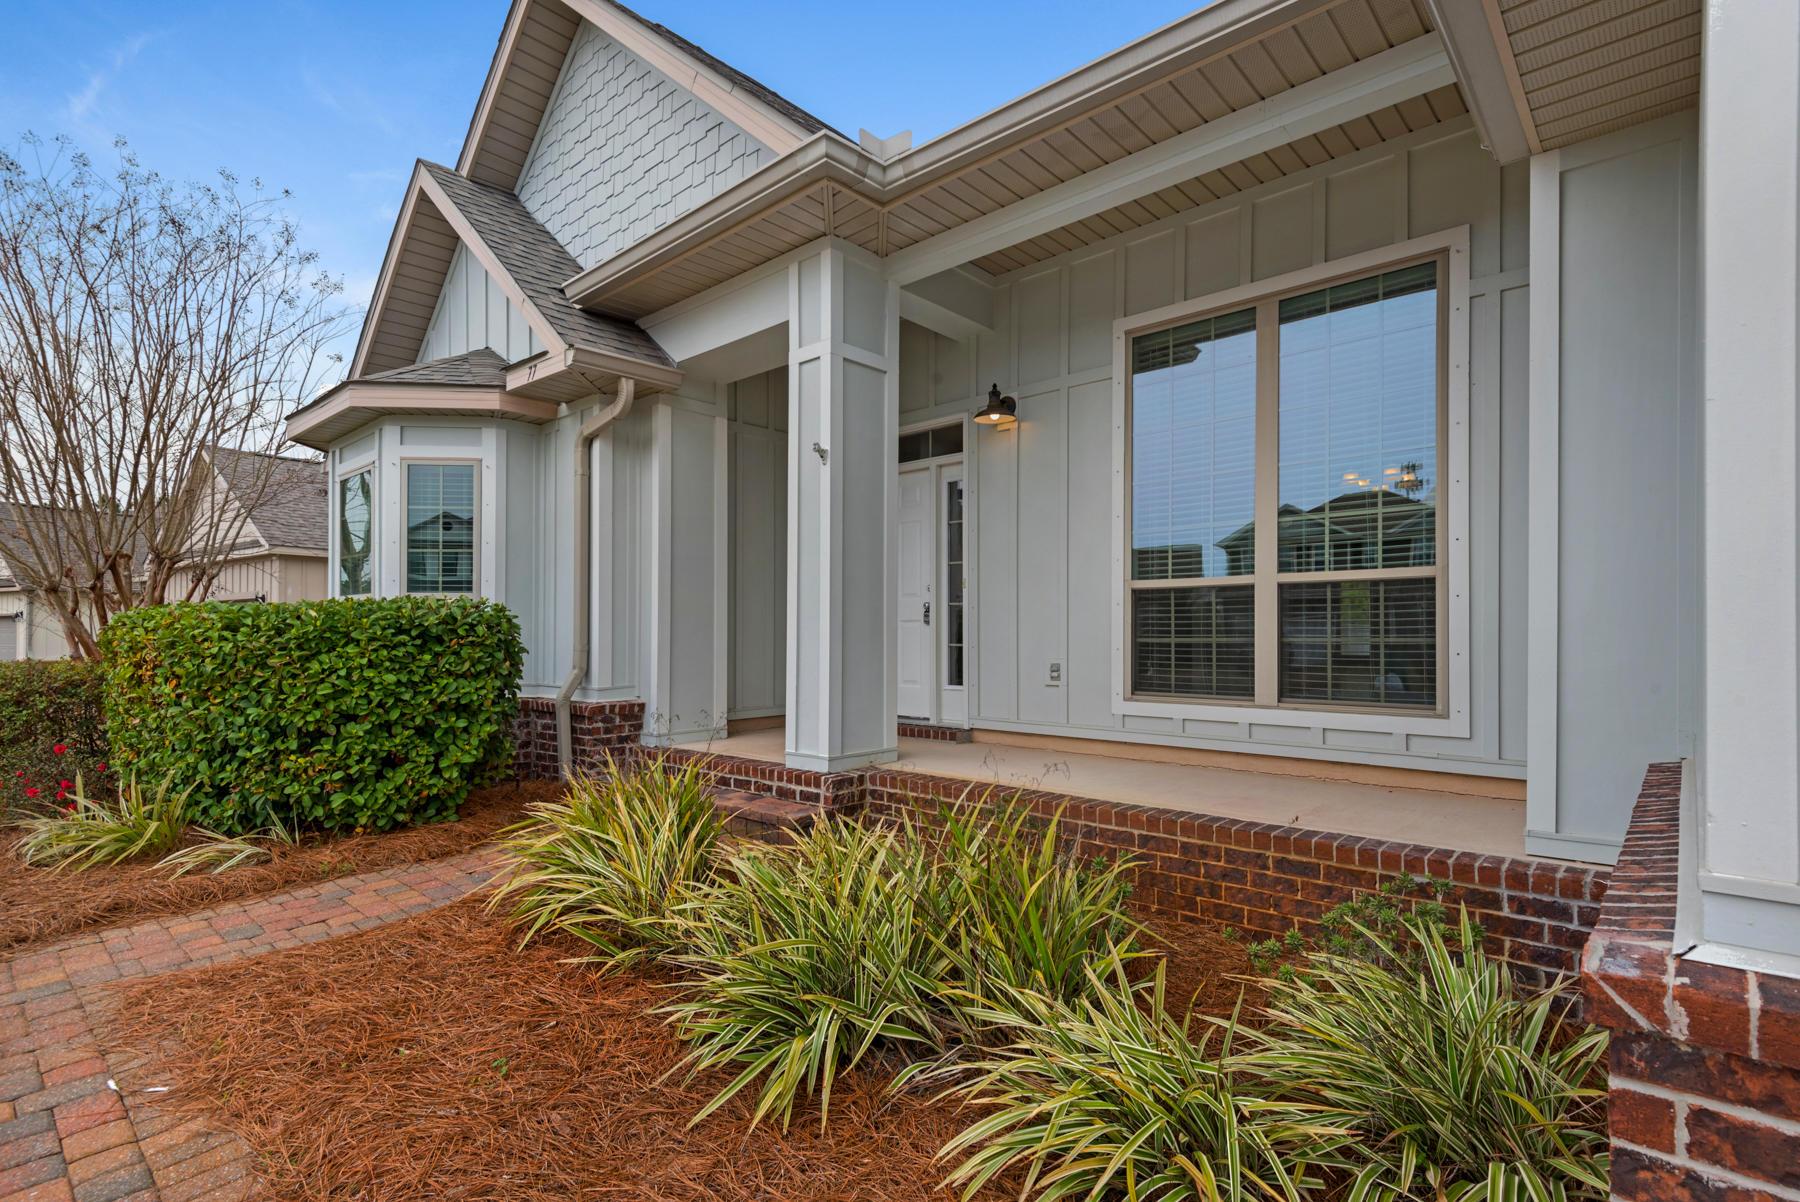 Photo of home for sale at 77 Pearl Aardon, Santa Rosa Beach FL